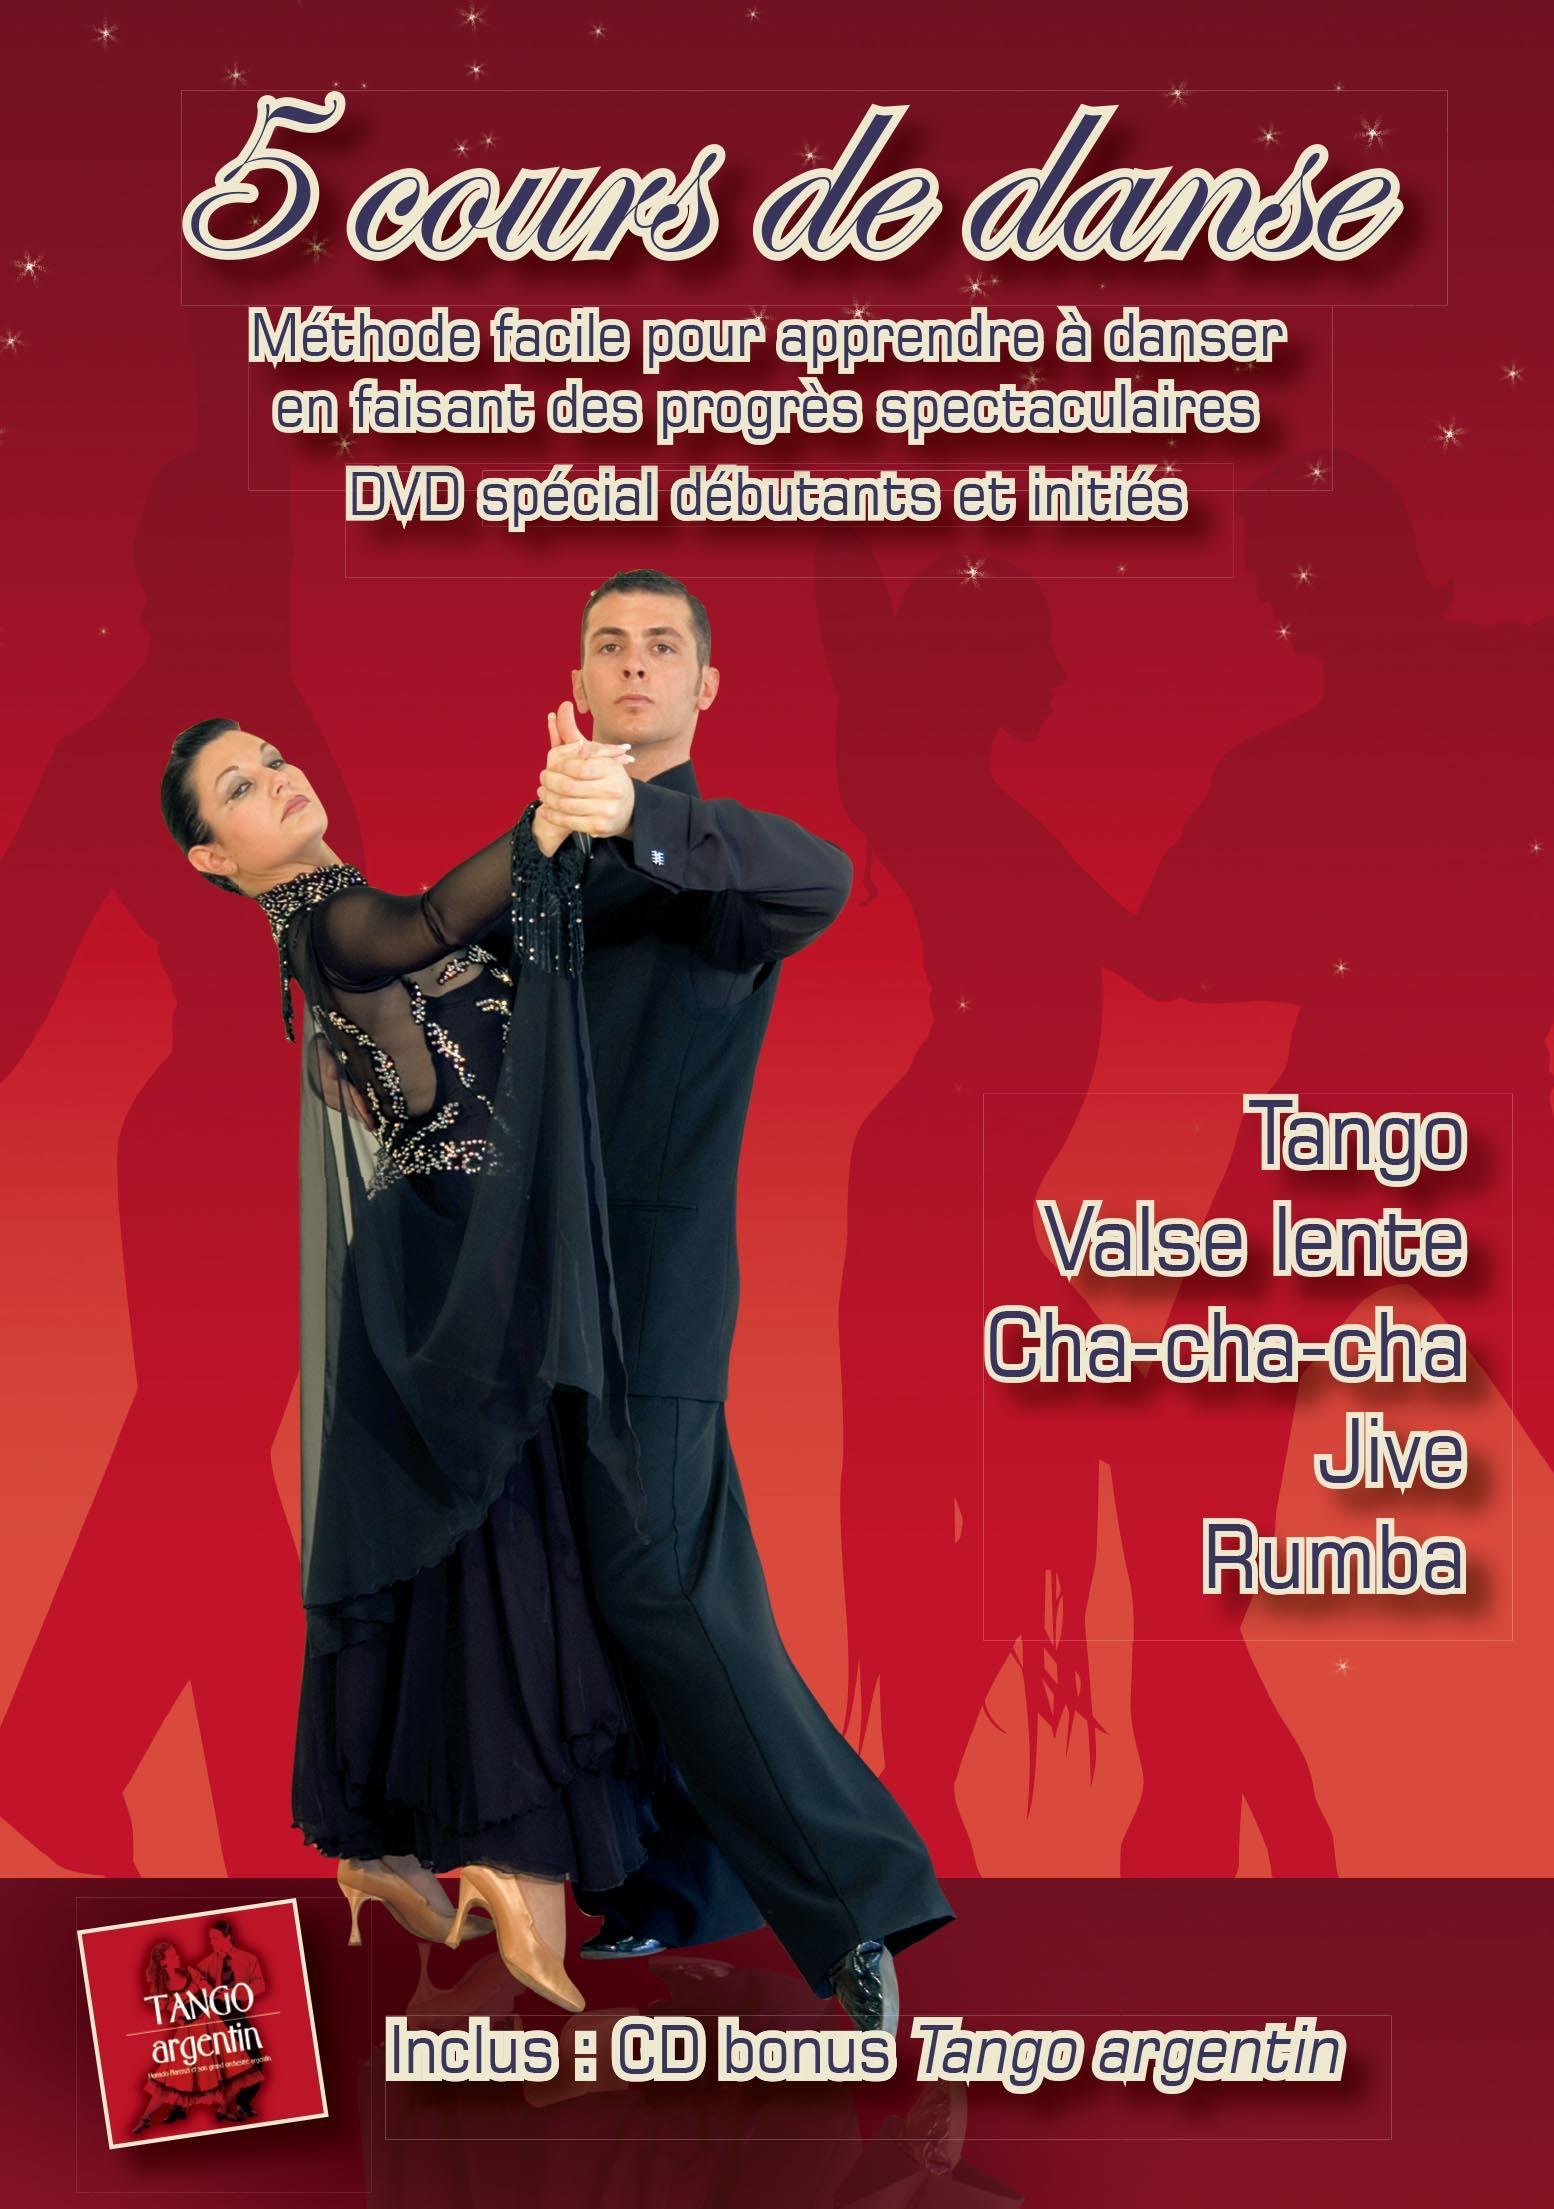 Cours de tango, valse lente, cha-cha-cha, jive, rumba - 5 dvd + cd